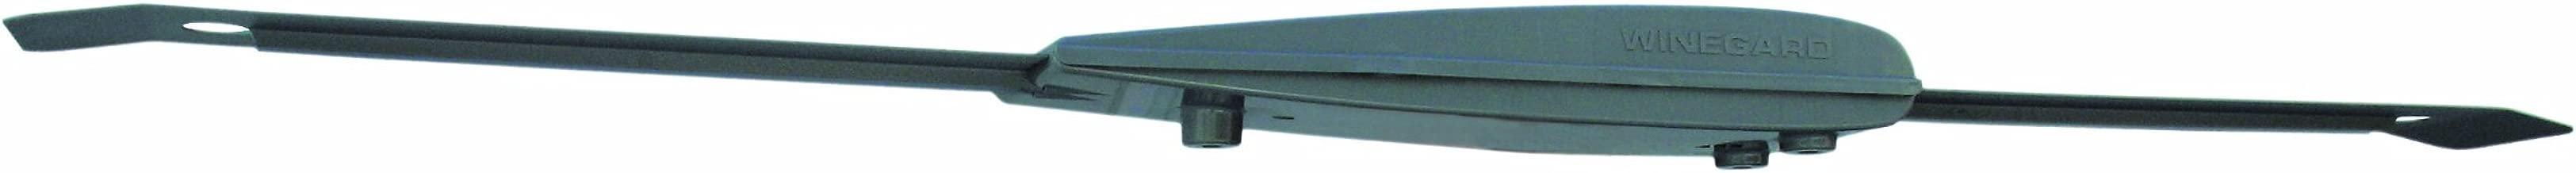 Winegard GS-2200 Sensar III Digital Ready Antenna